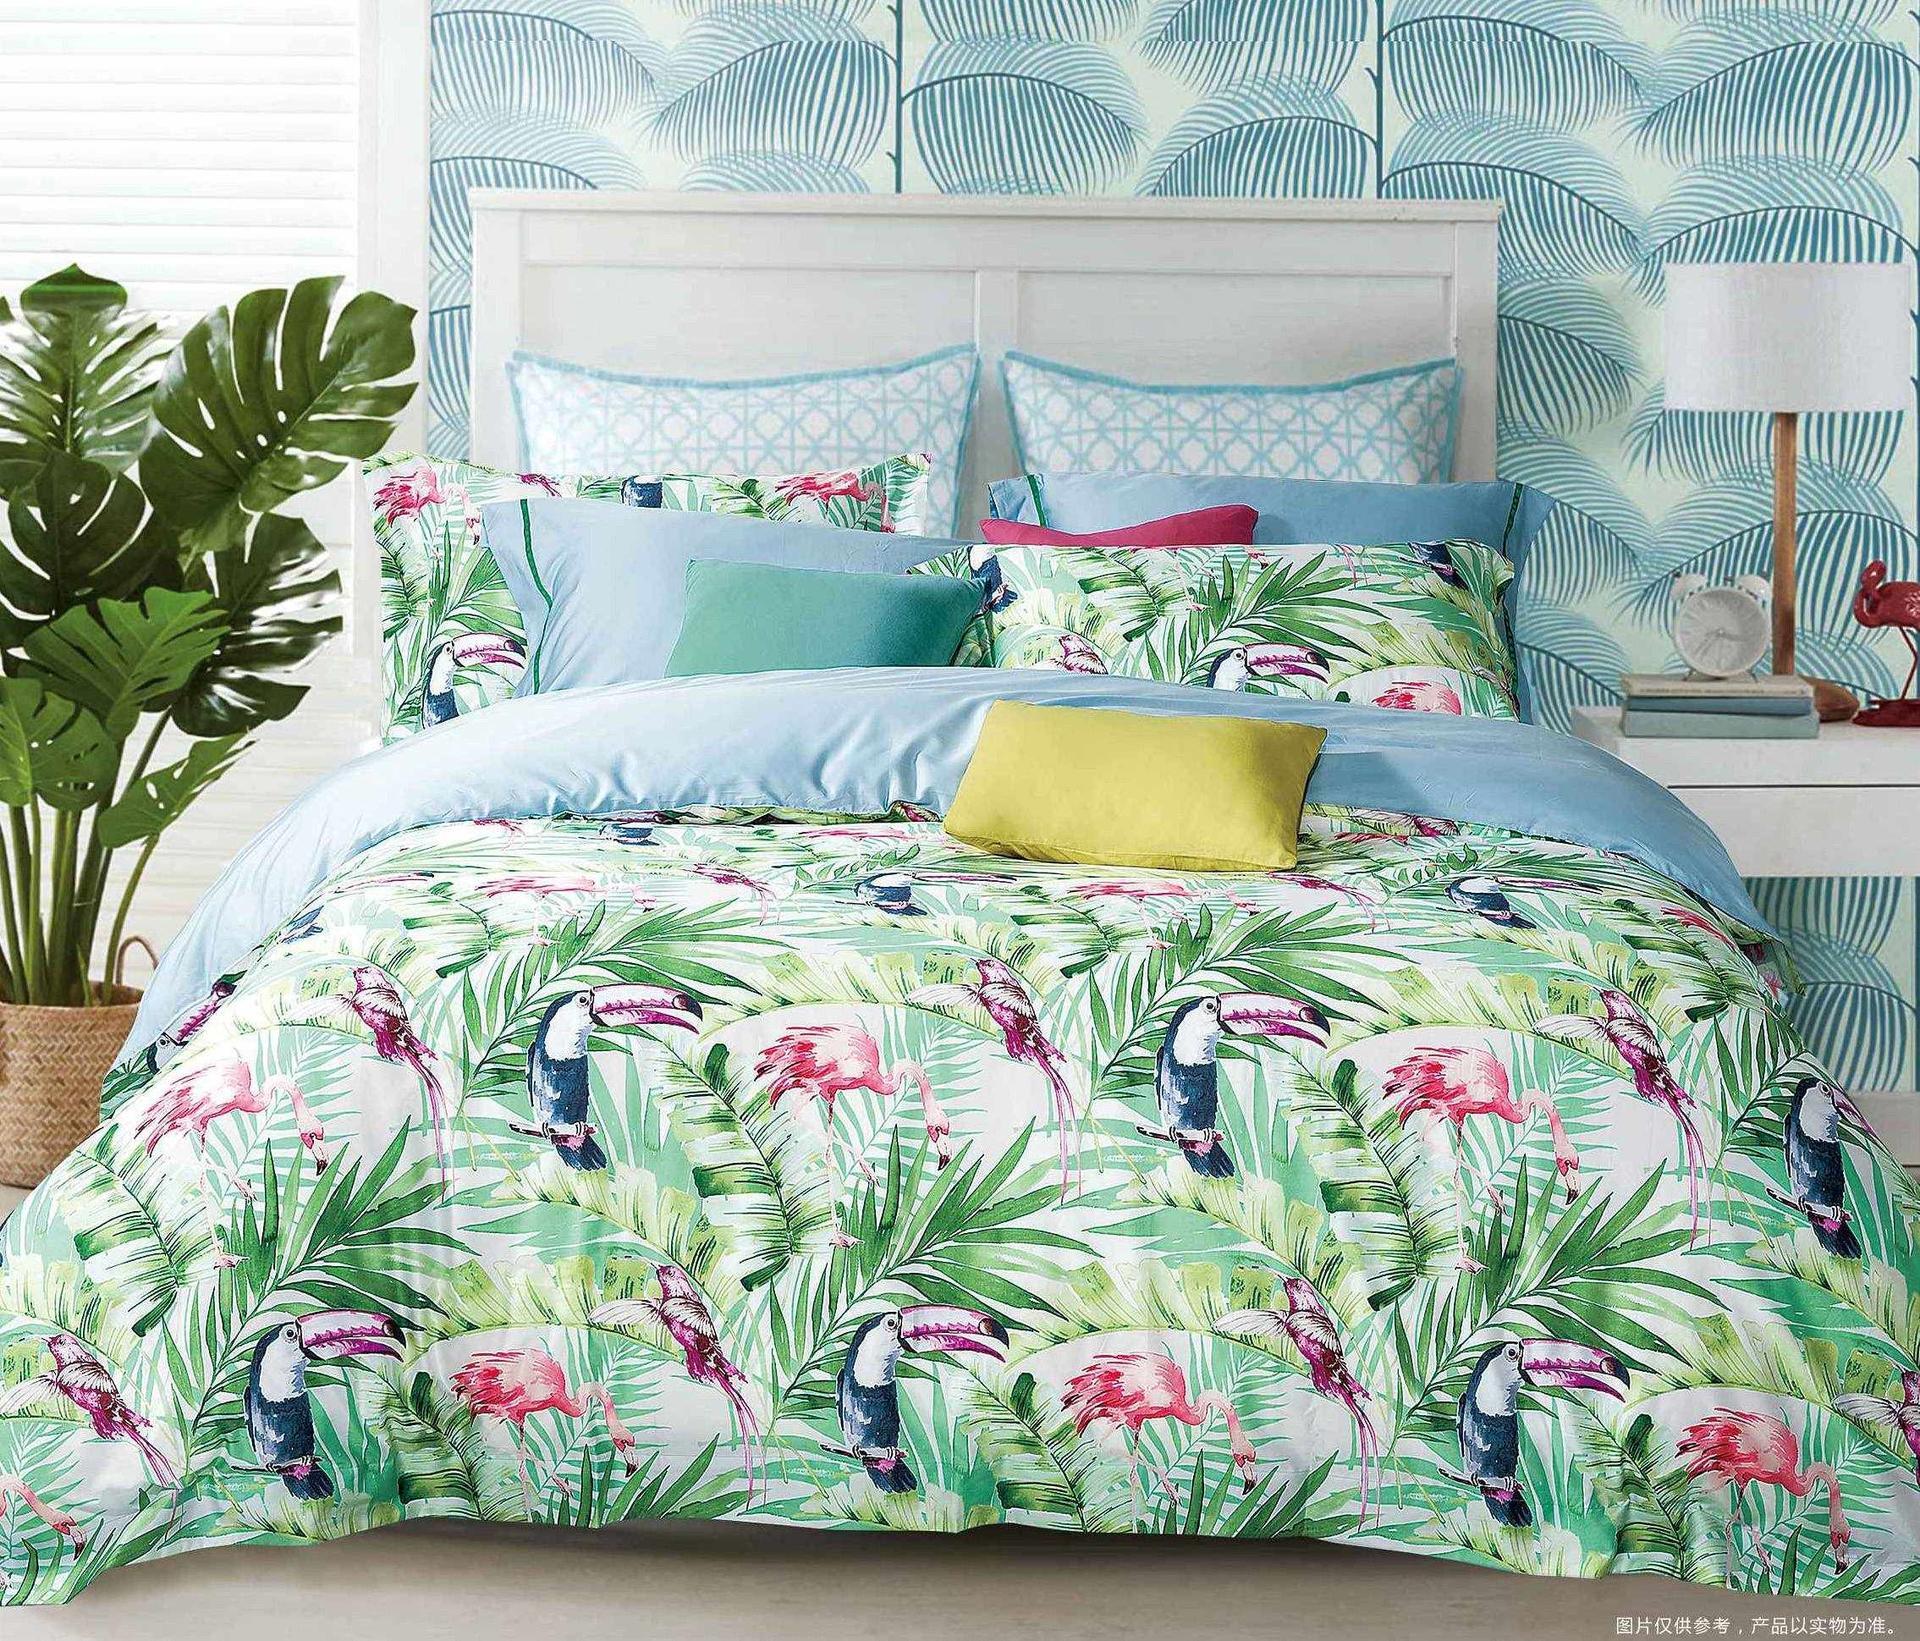 Tropical 500 Thread Count High Density Cotton Bedding Set 171058